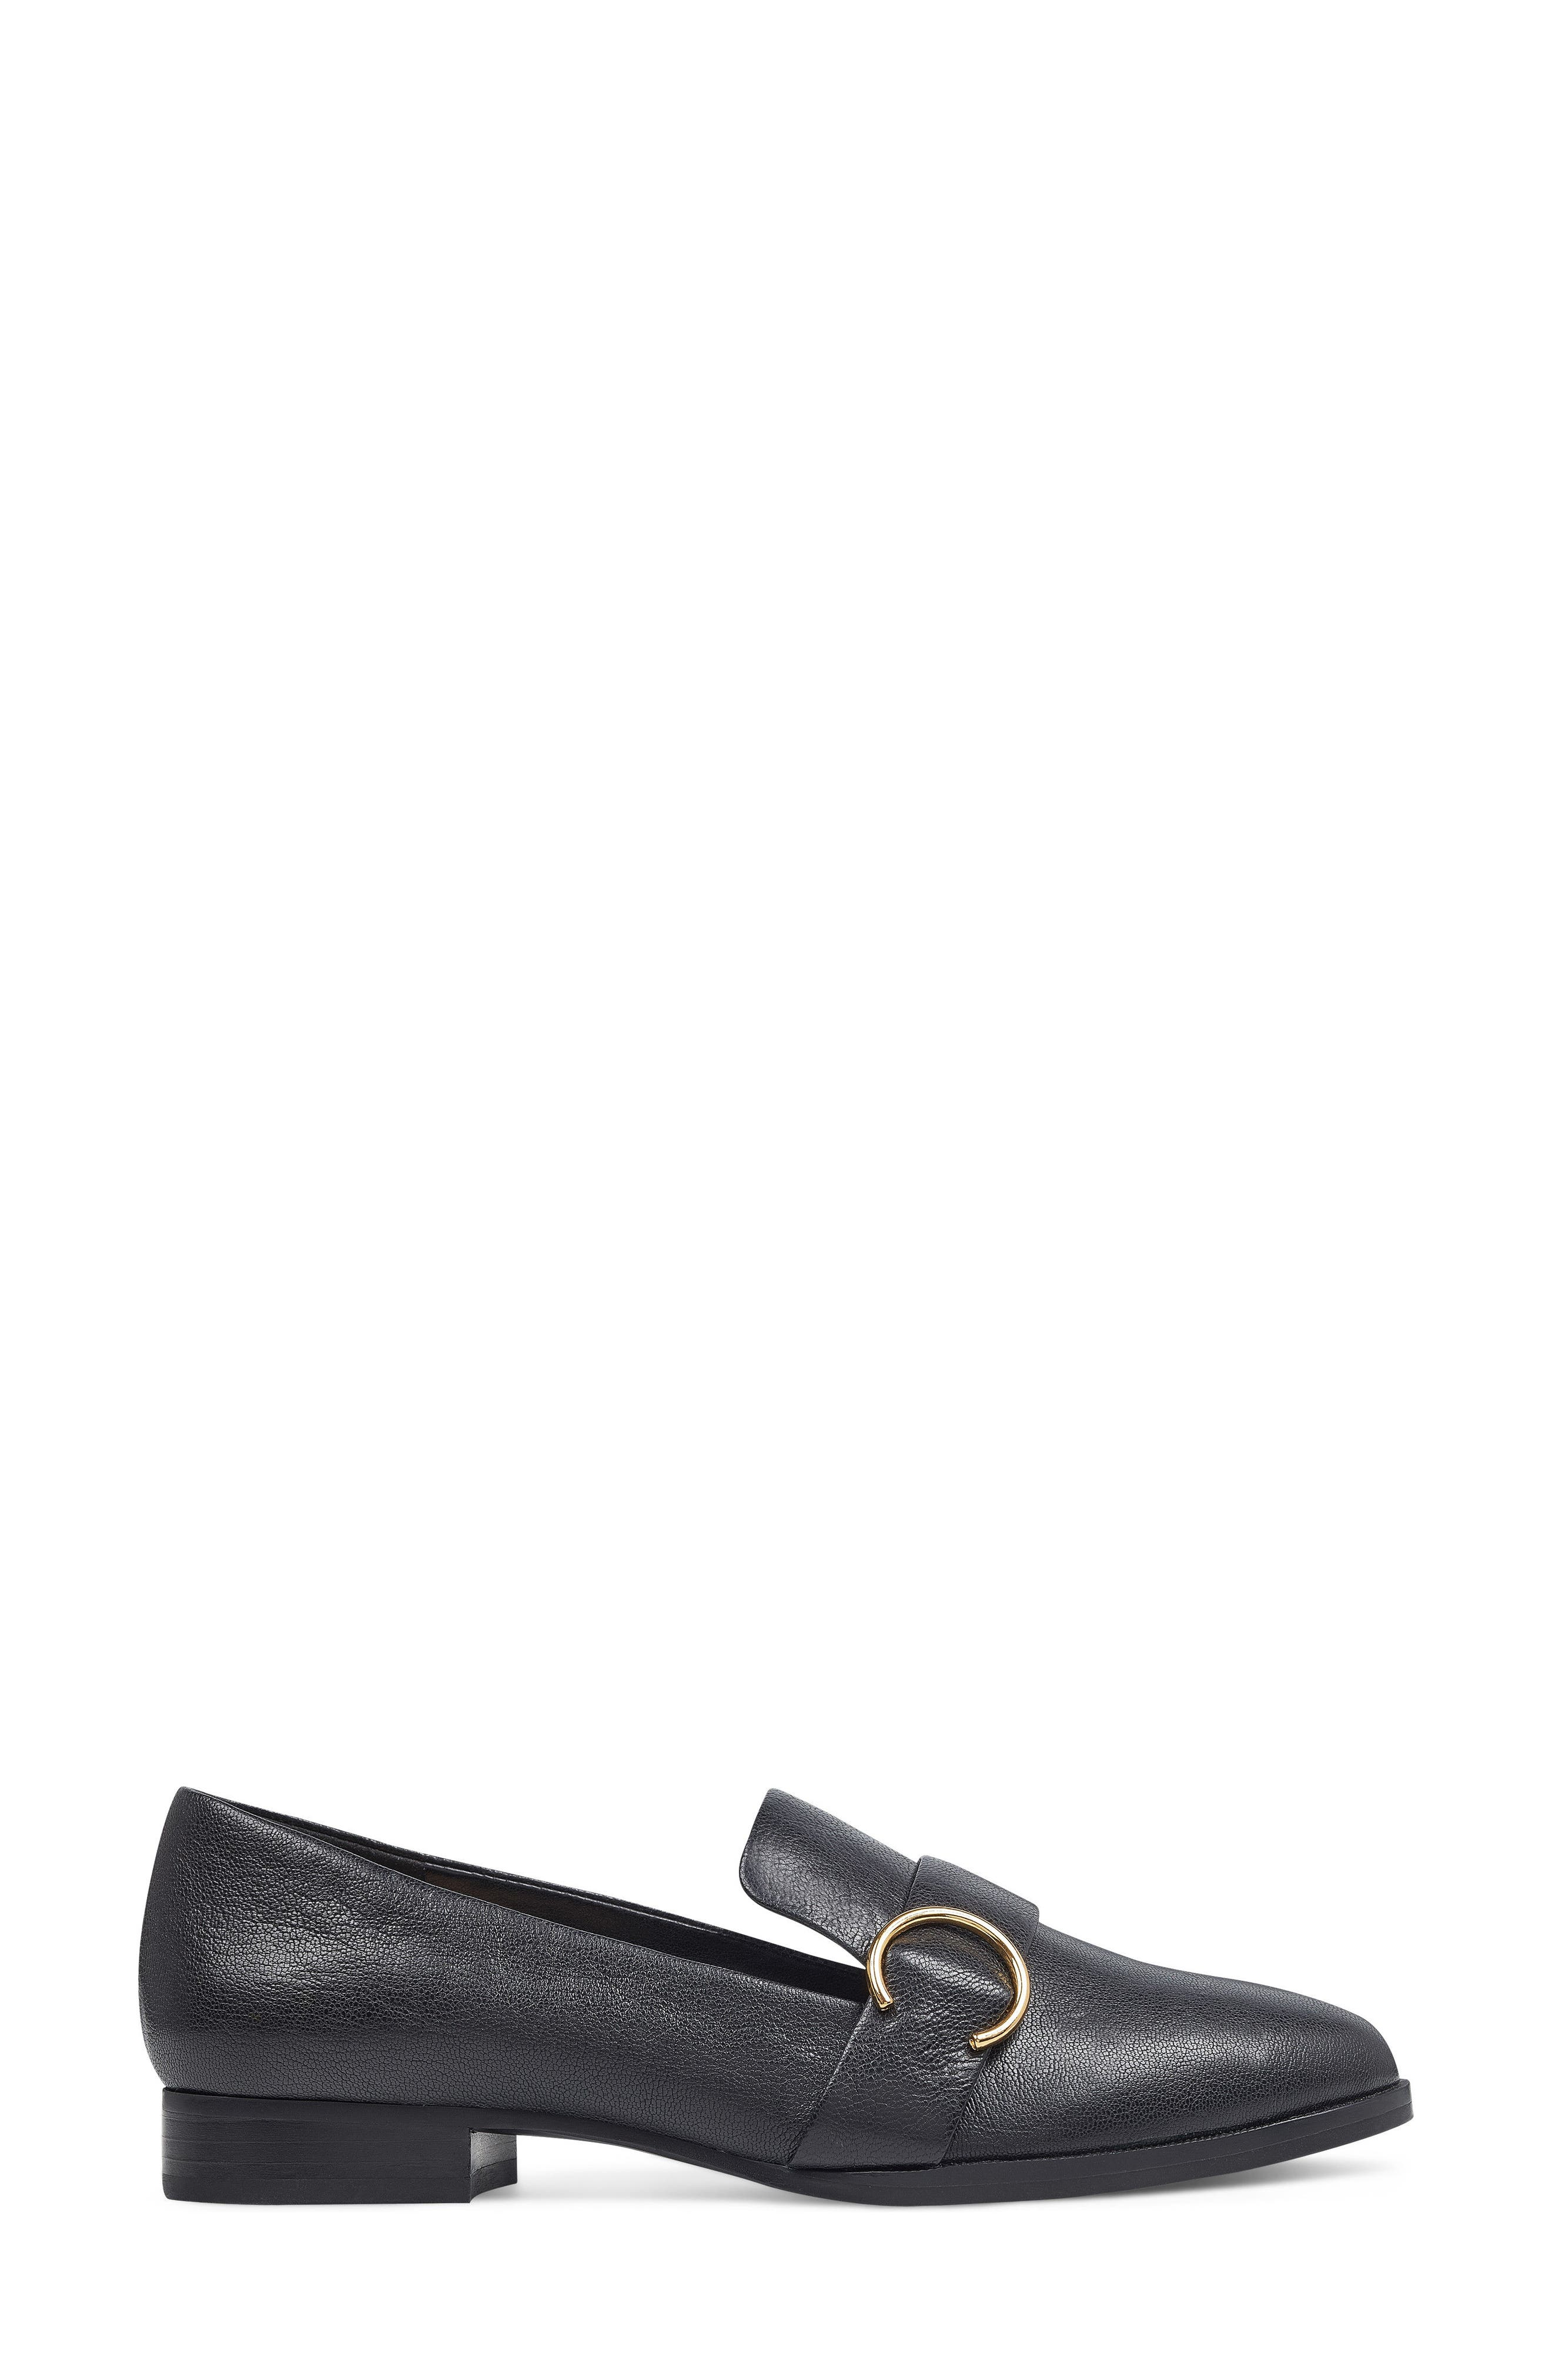 Huff Loafer Flat,                             Alternate thumbnail 3, color,                             Black Leather